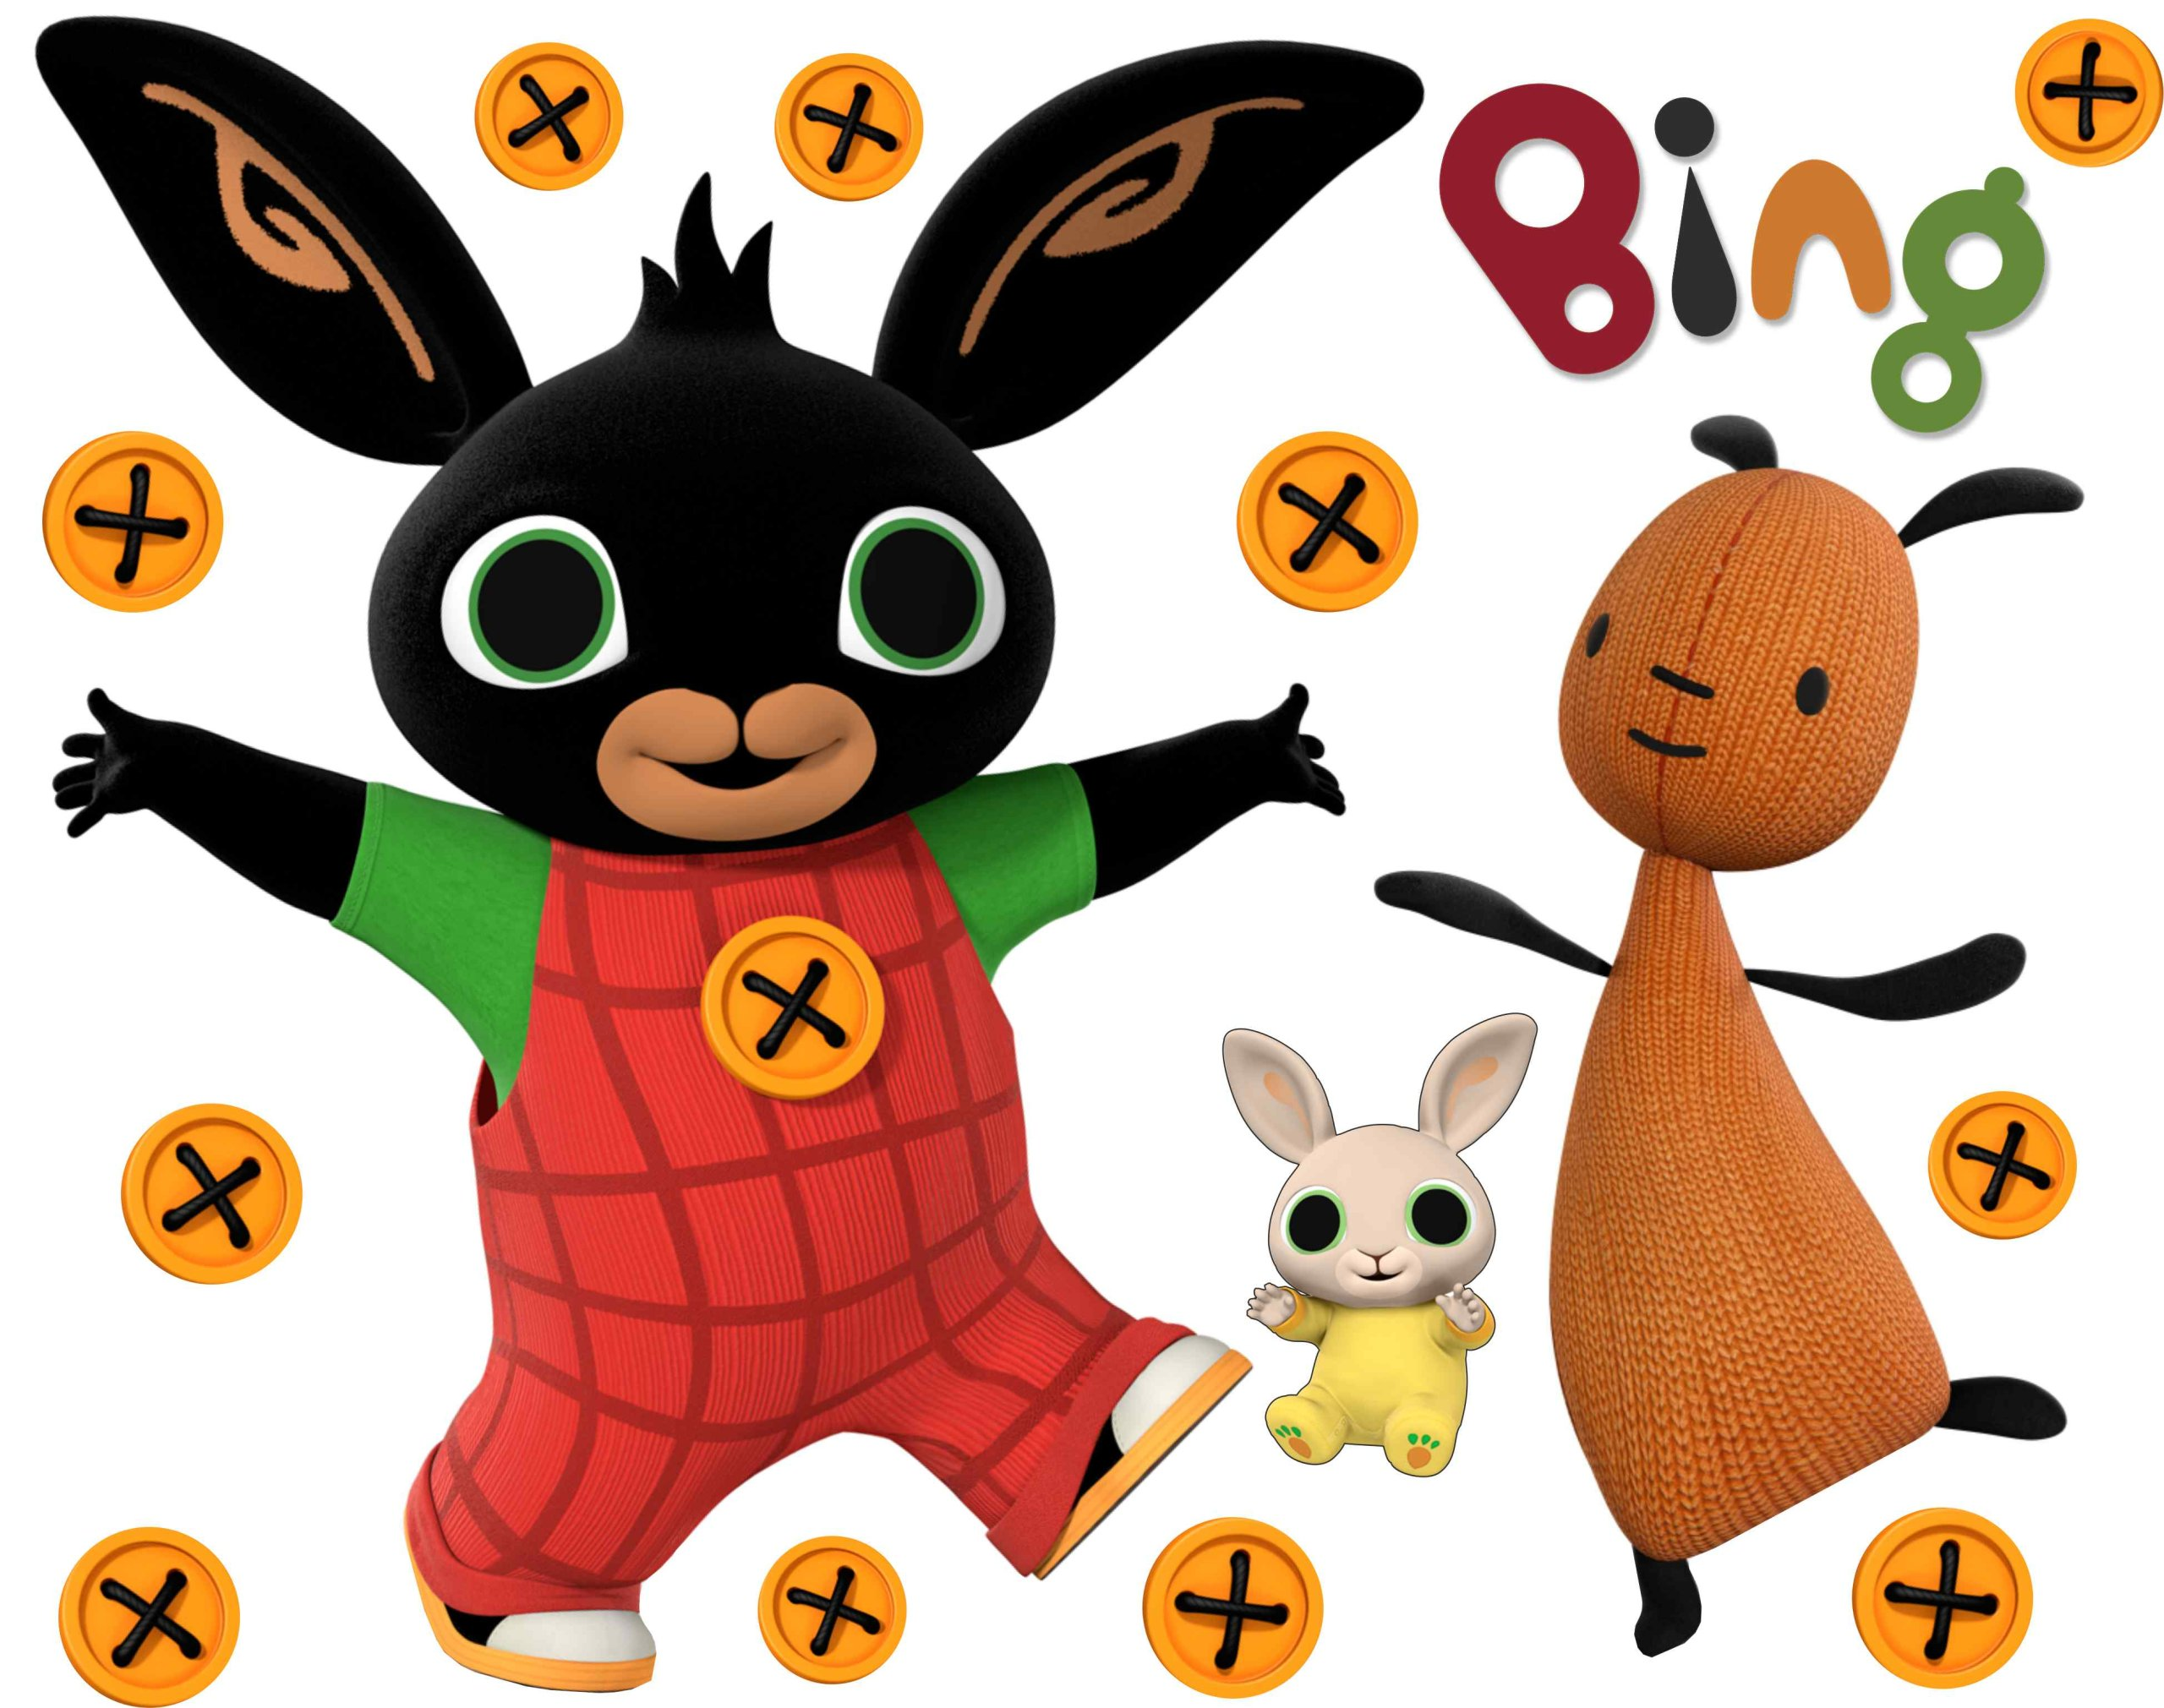 Samolepky Bing Bunny, Flop a Charlie Pack